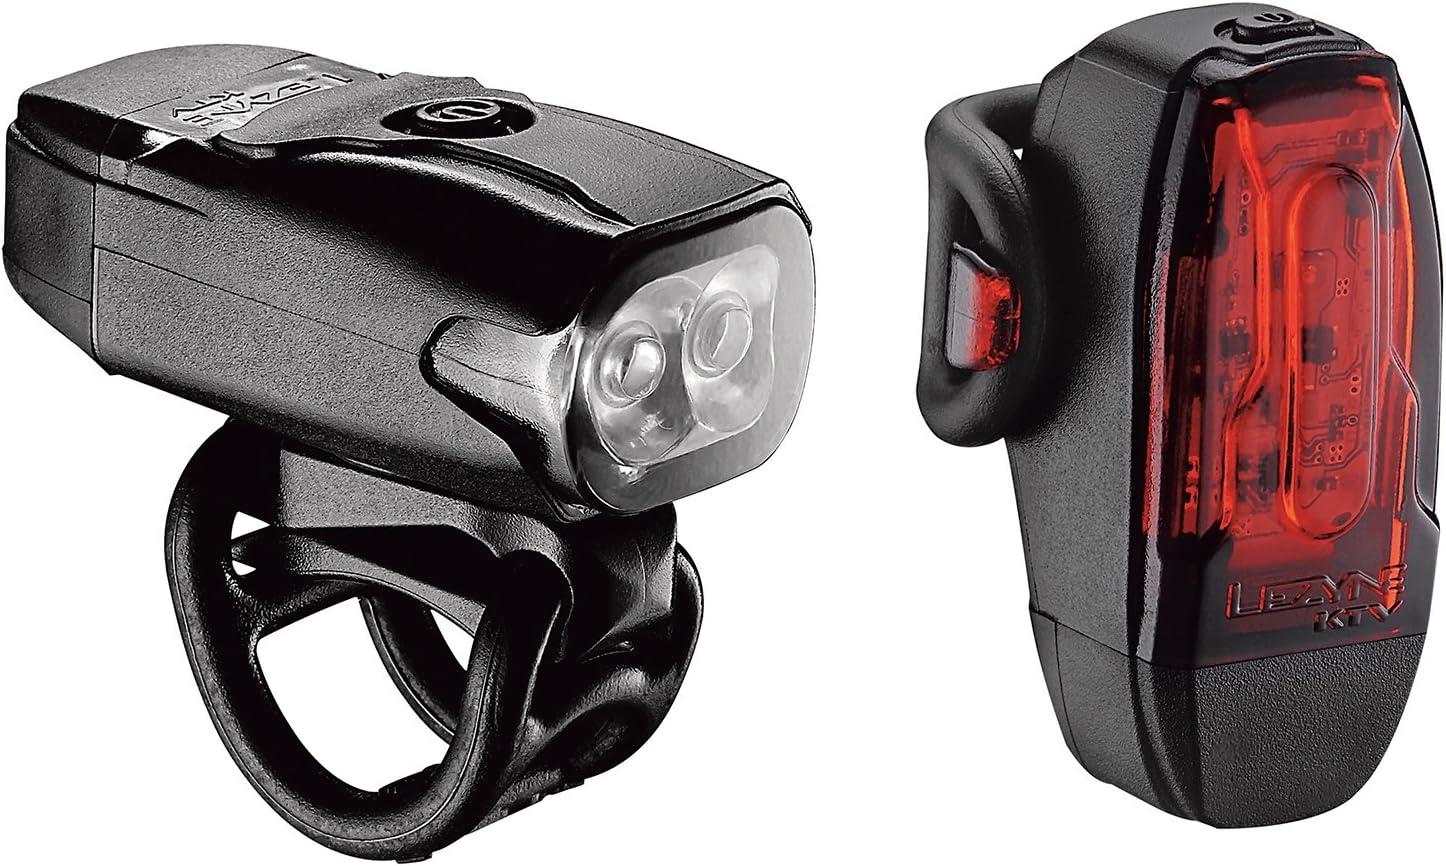 LEZYNE MICRO DRIVE 500XL BLACK BICYCLE HEADLIGHT AND TAILLING SET Bike Light Set